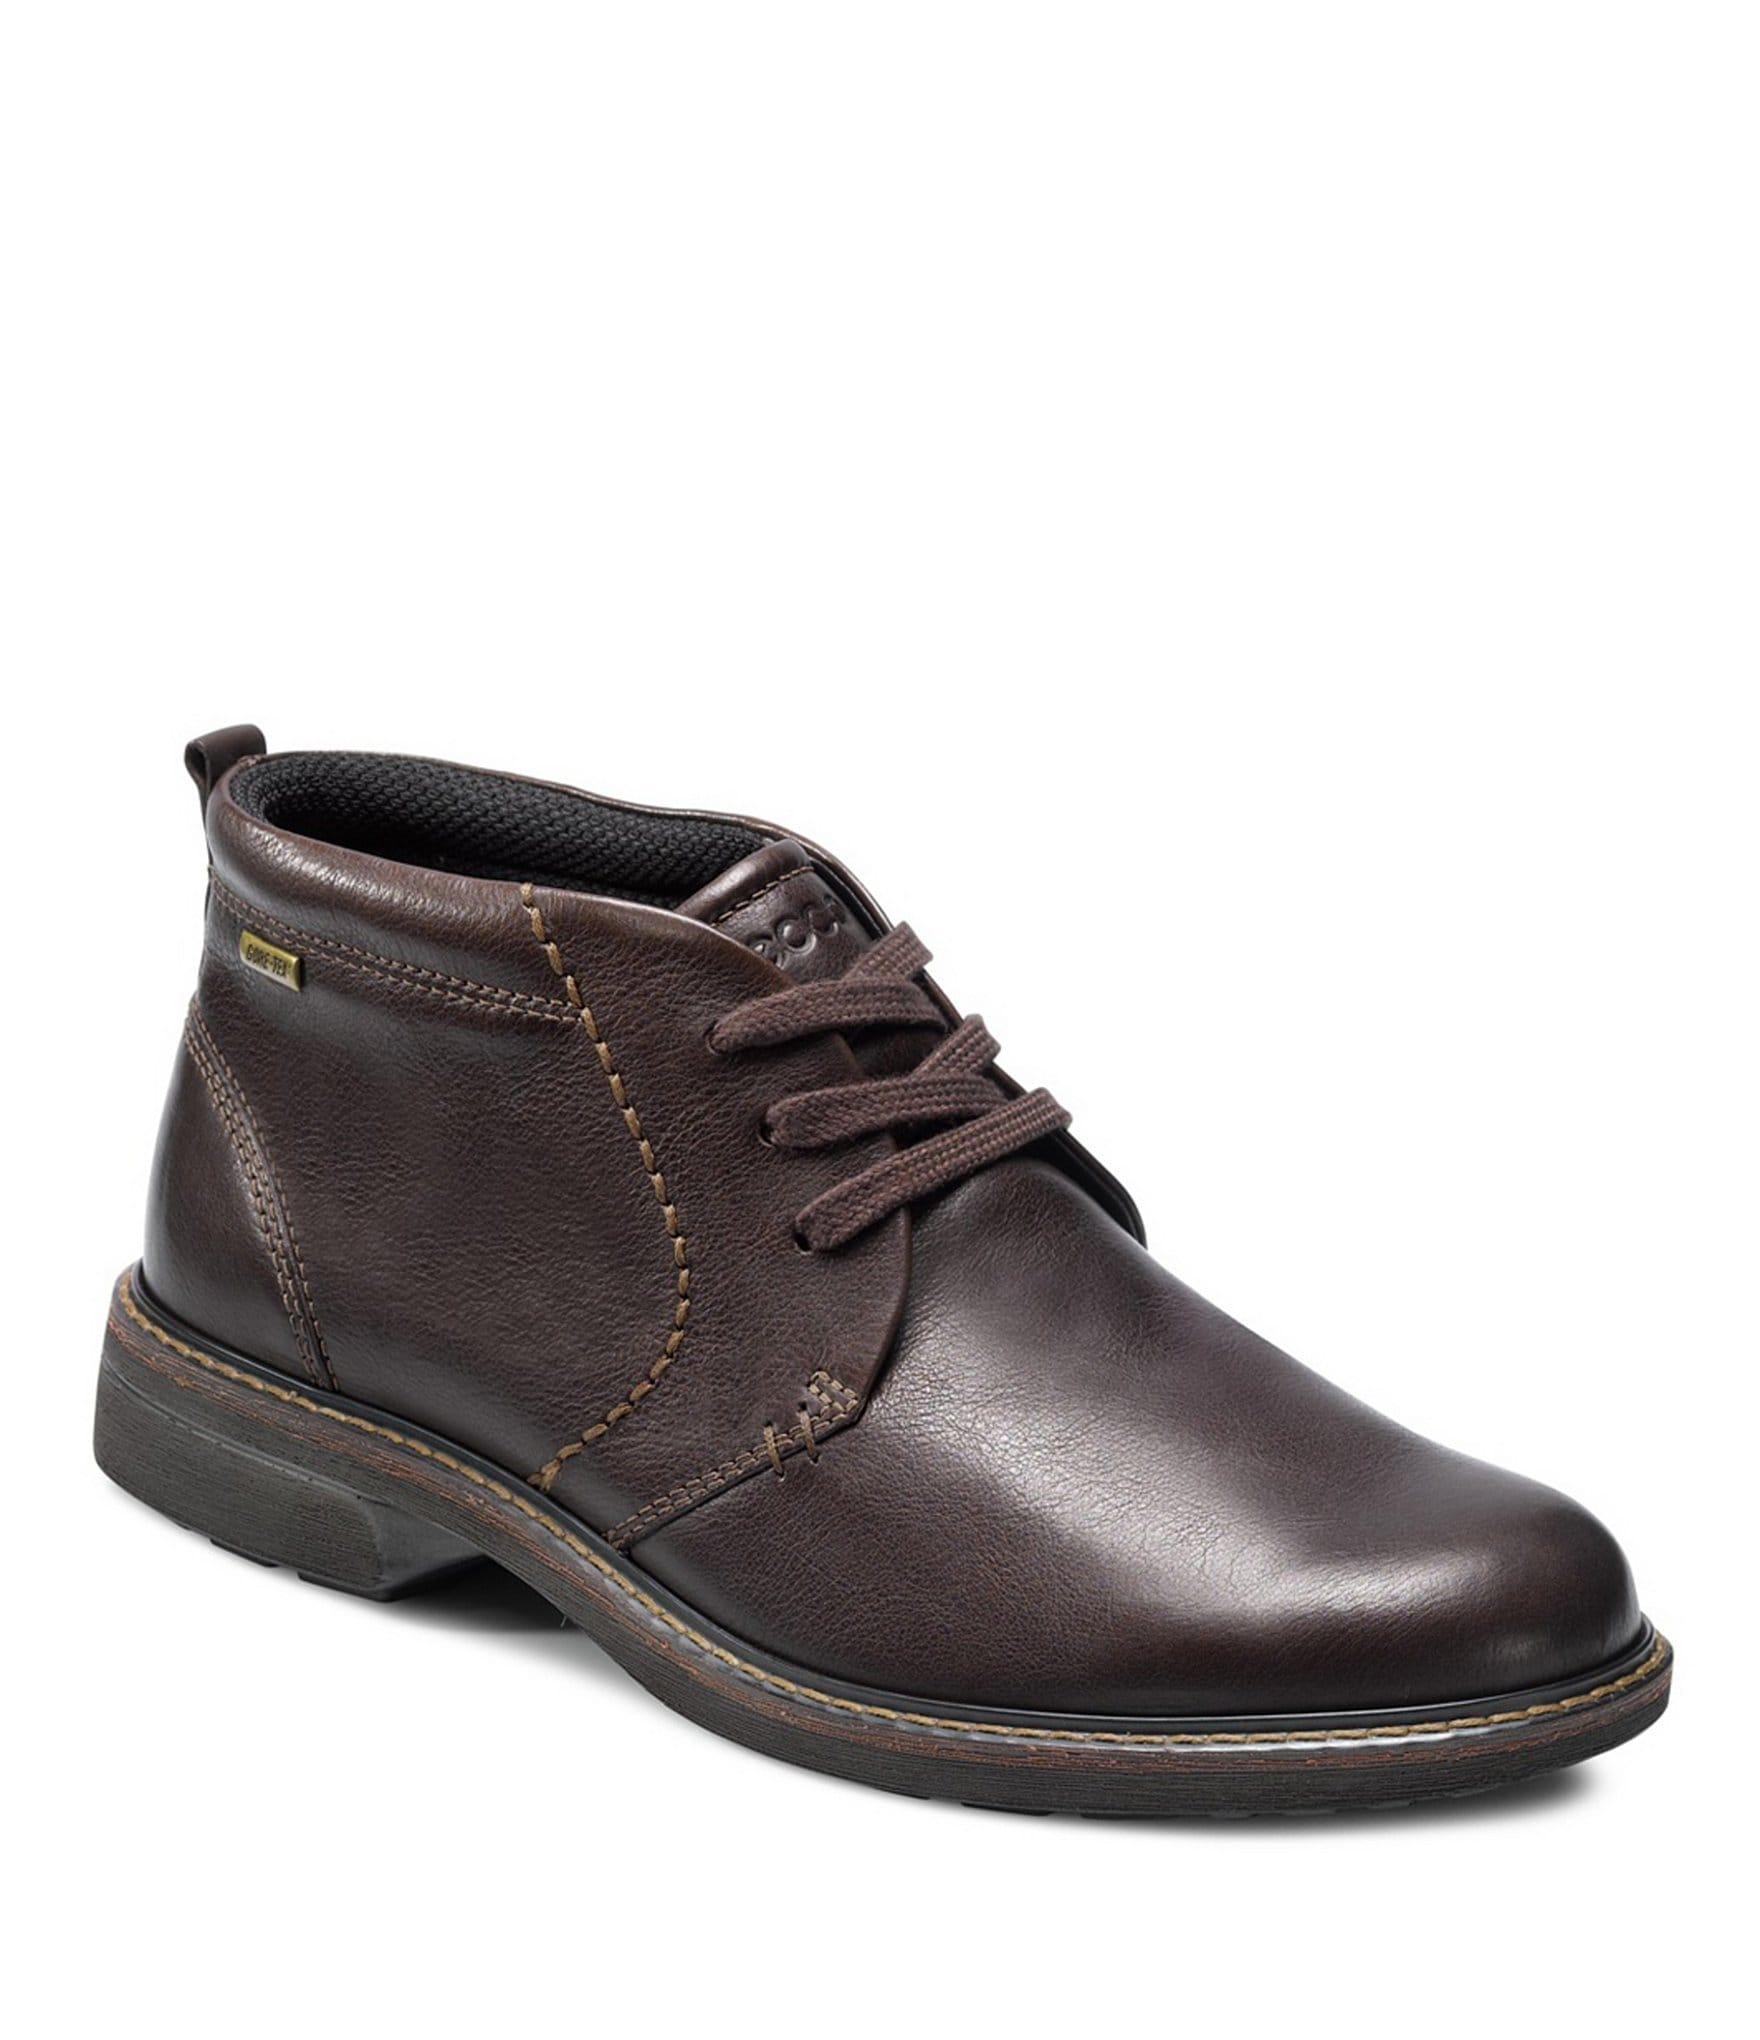 ecco turn gtx s dress chukka boots dillards